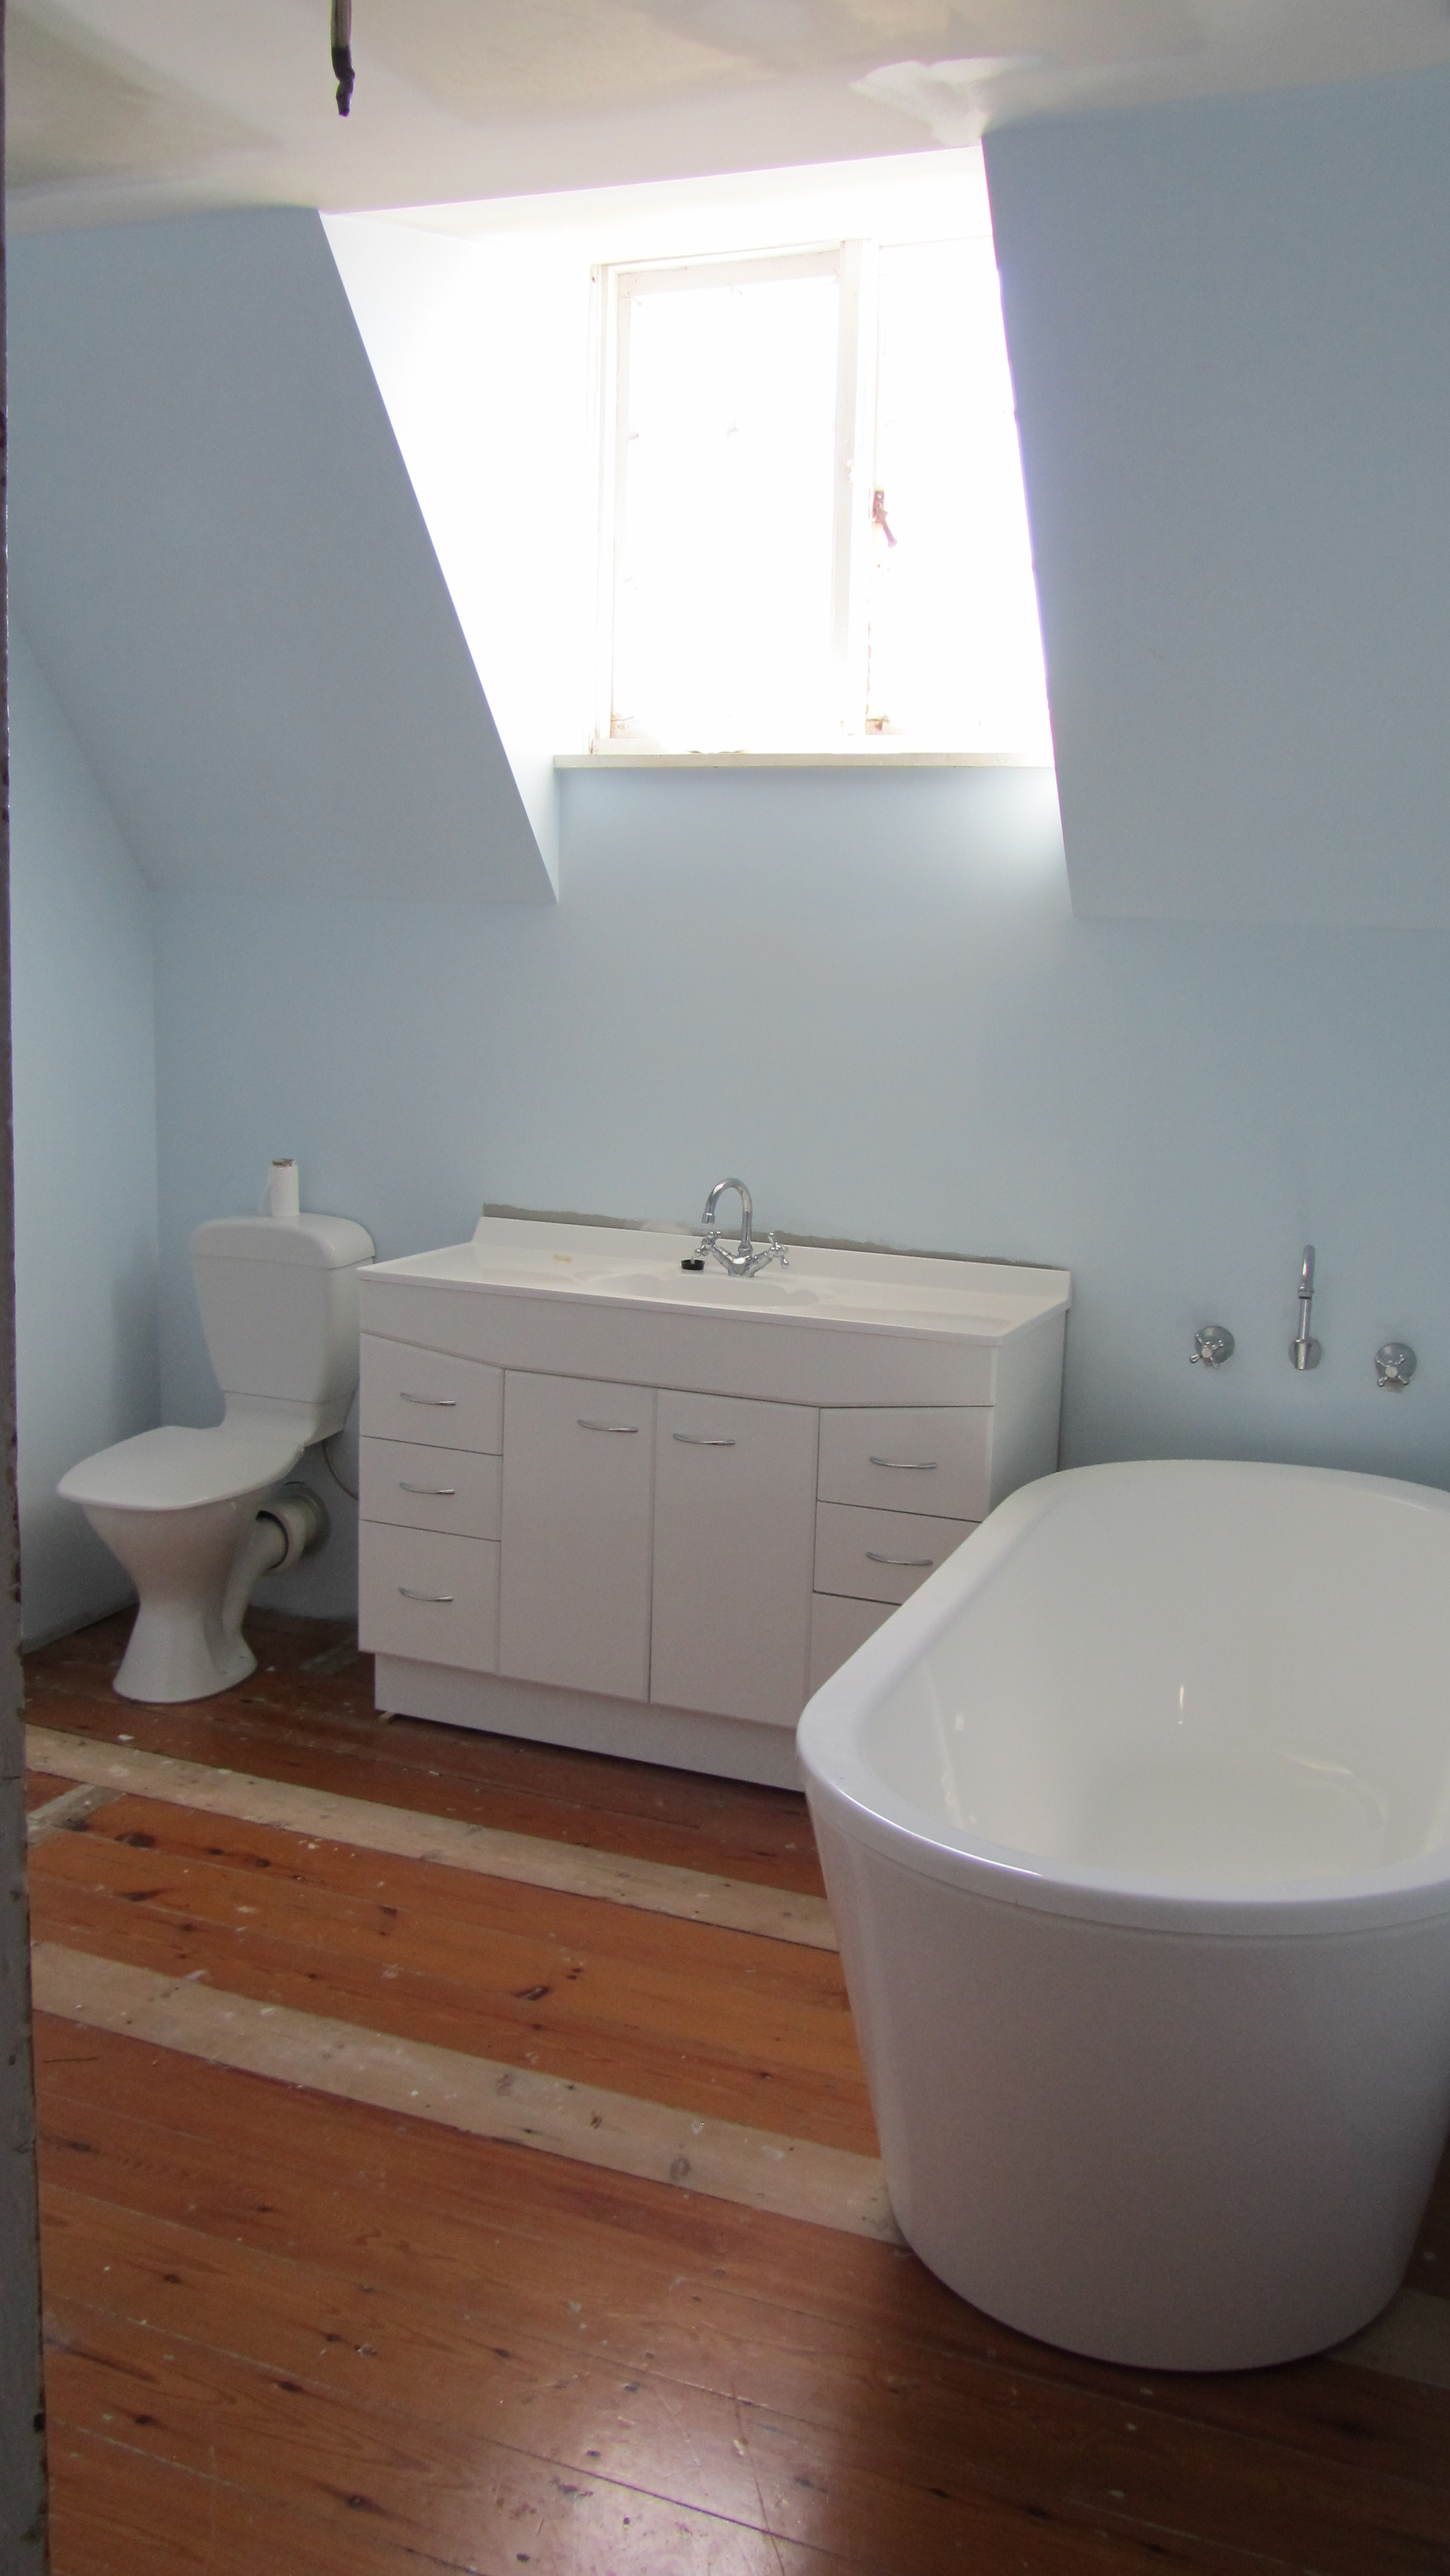 Interior upstairs bathroom in fmr attic